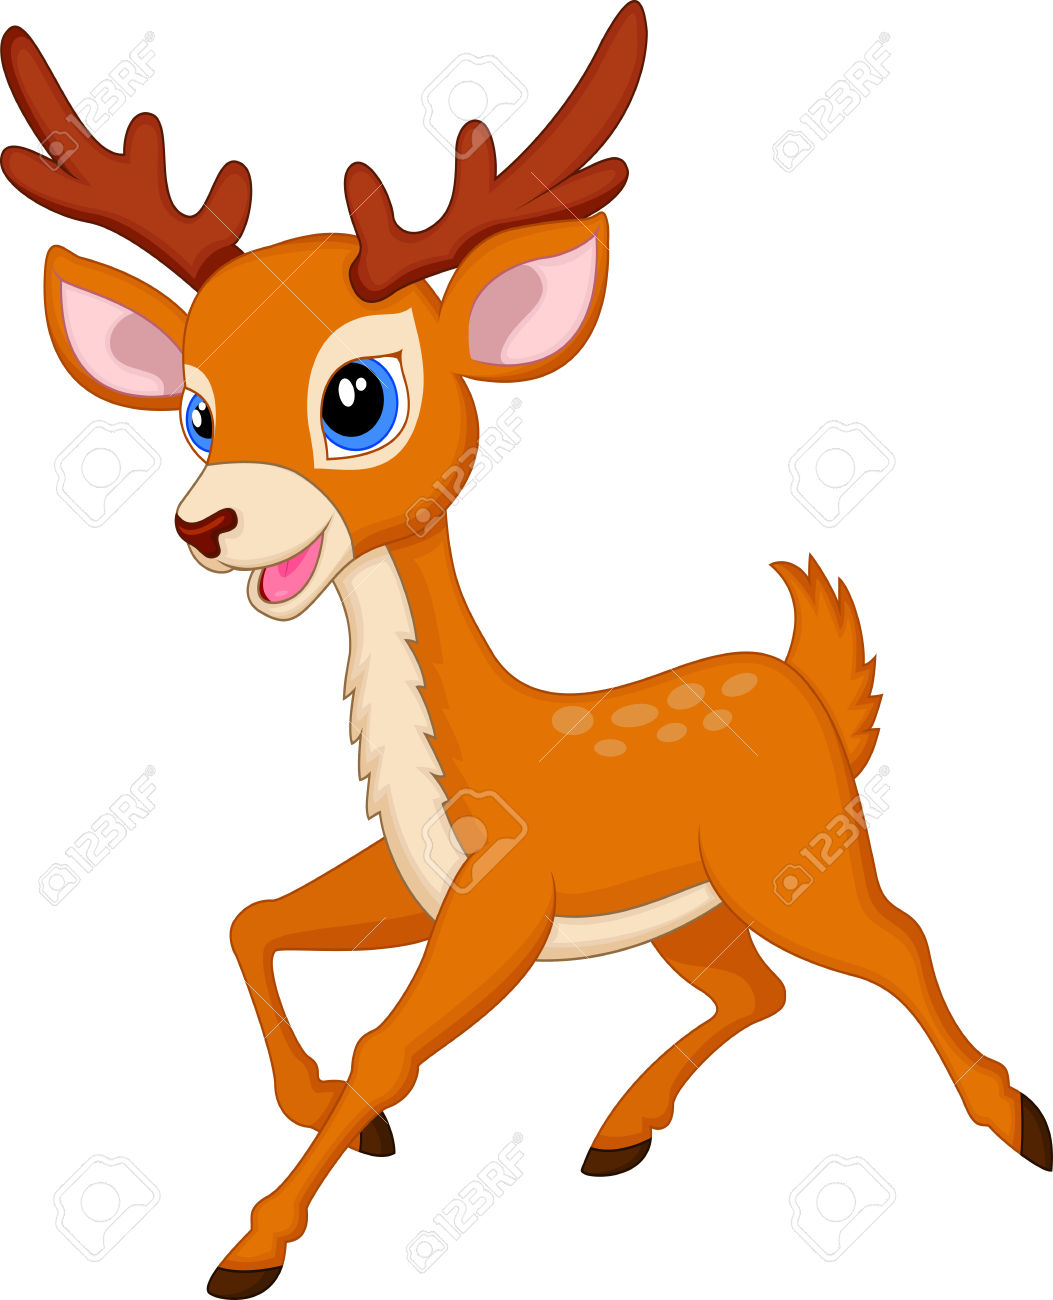 Deer Clip Art - Getbellhop-Deer Clip Art - Getbellhop-9